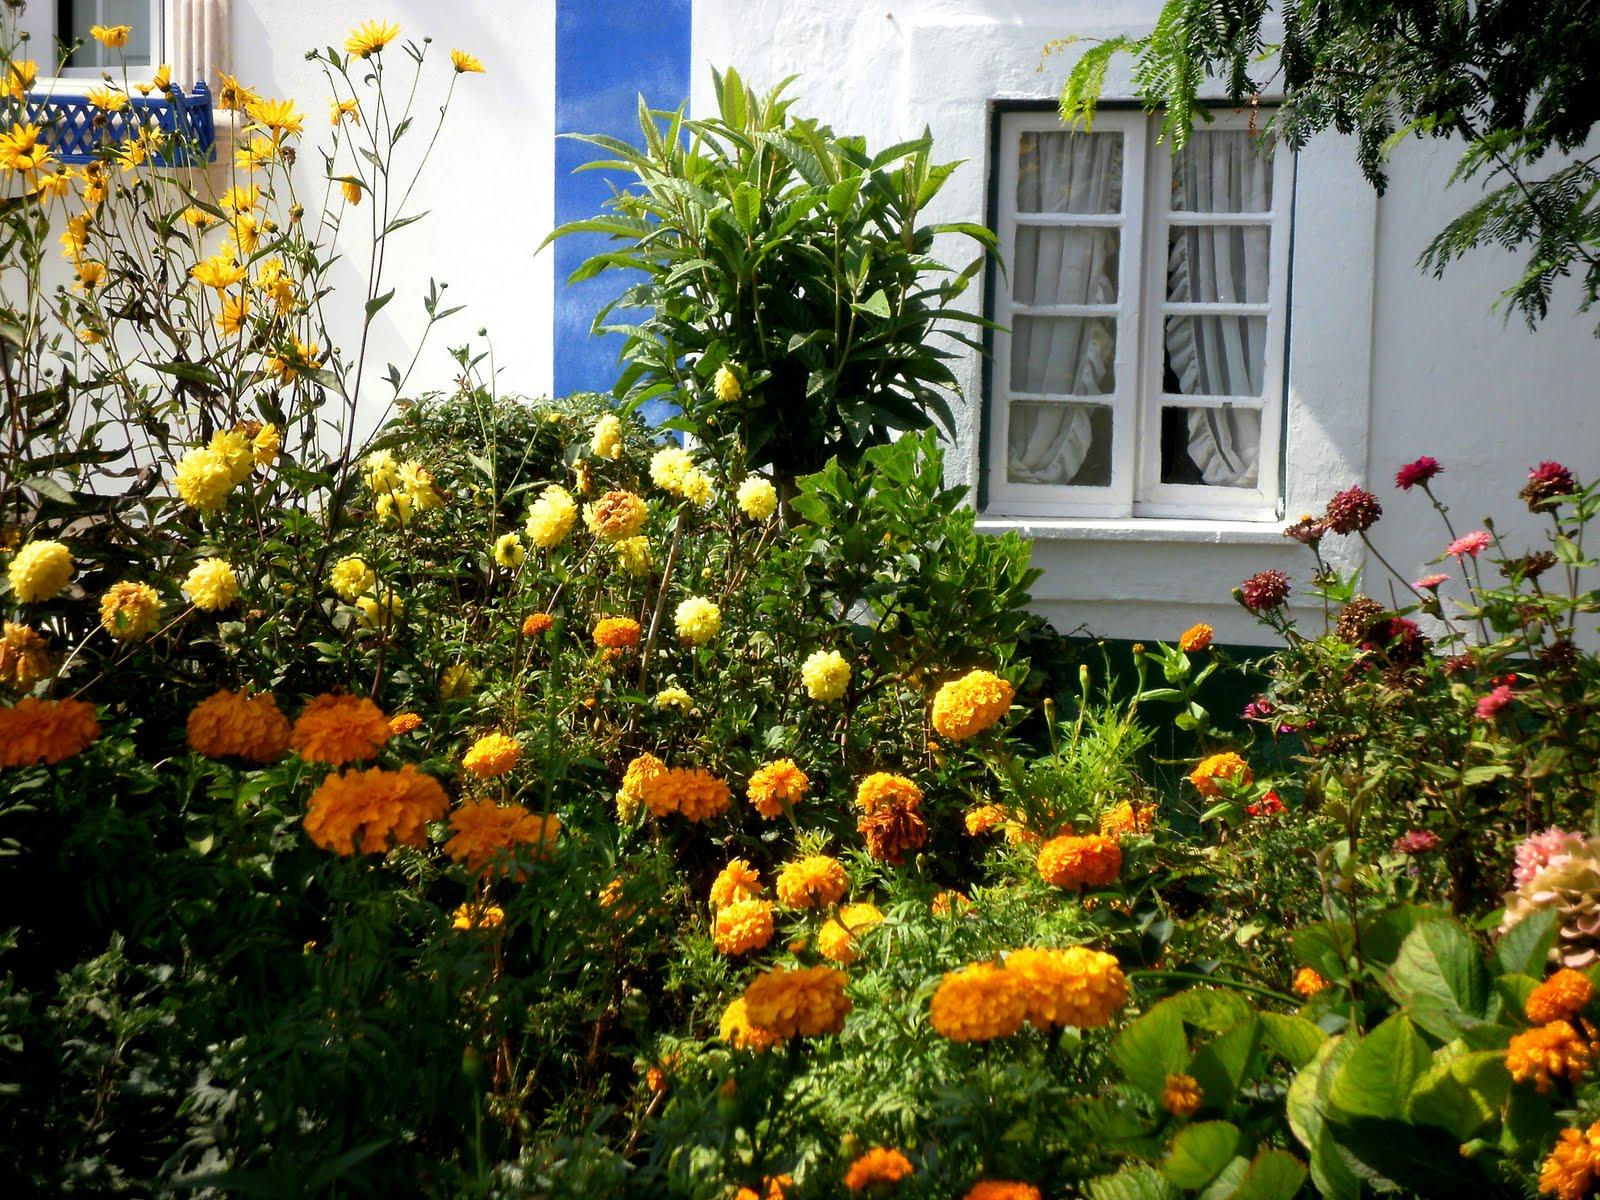 flores jardim de verao:Jardim Suspenso: Um Jardim Português